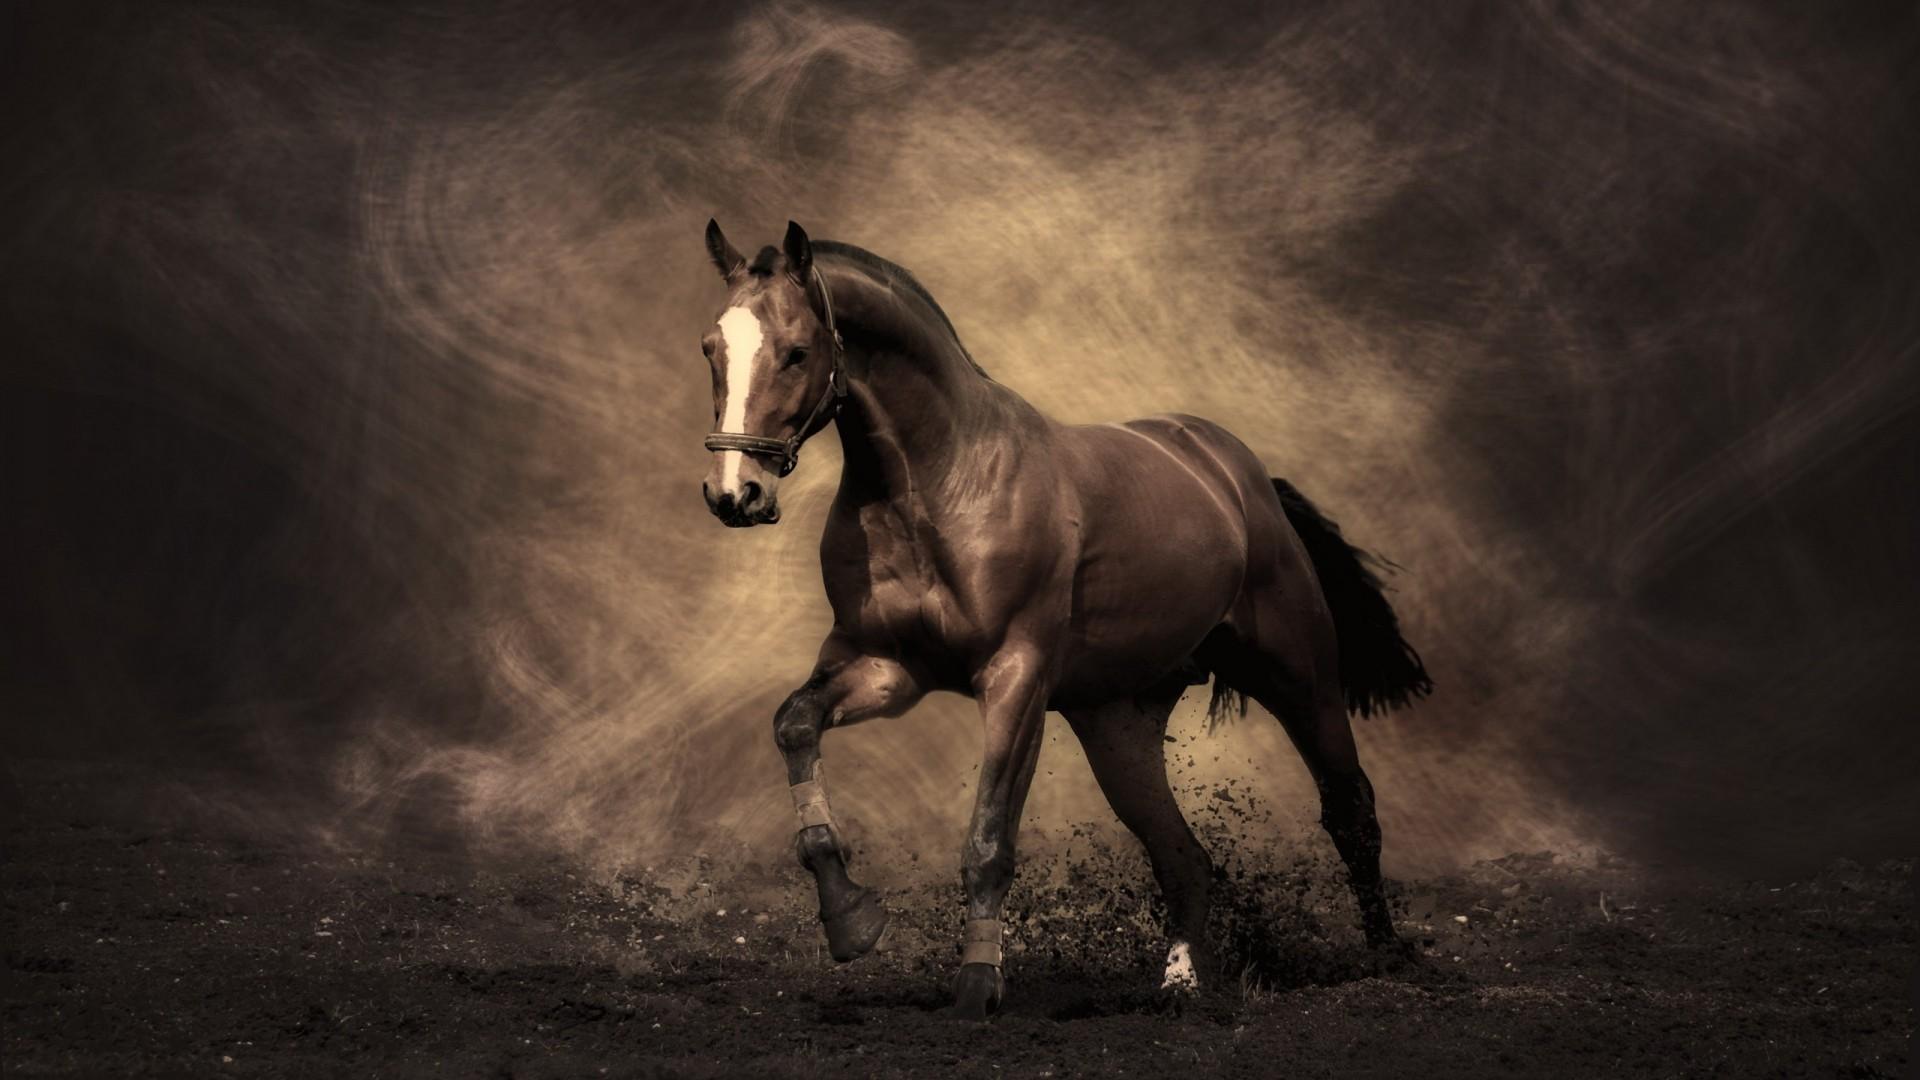 Res: 1920x1080, Horse